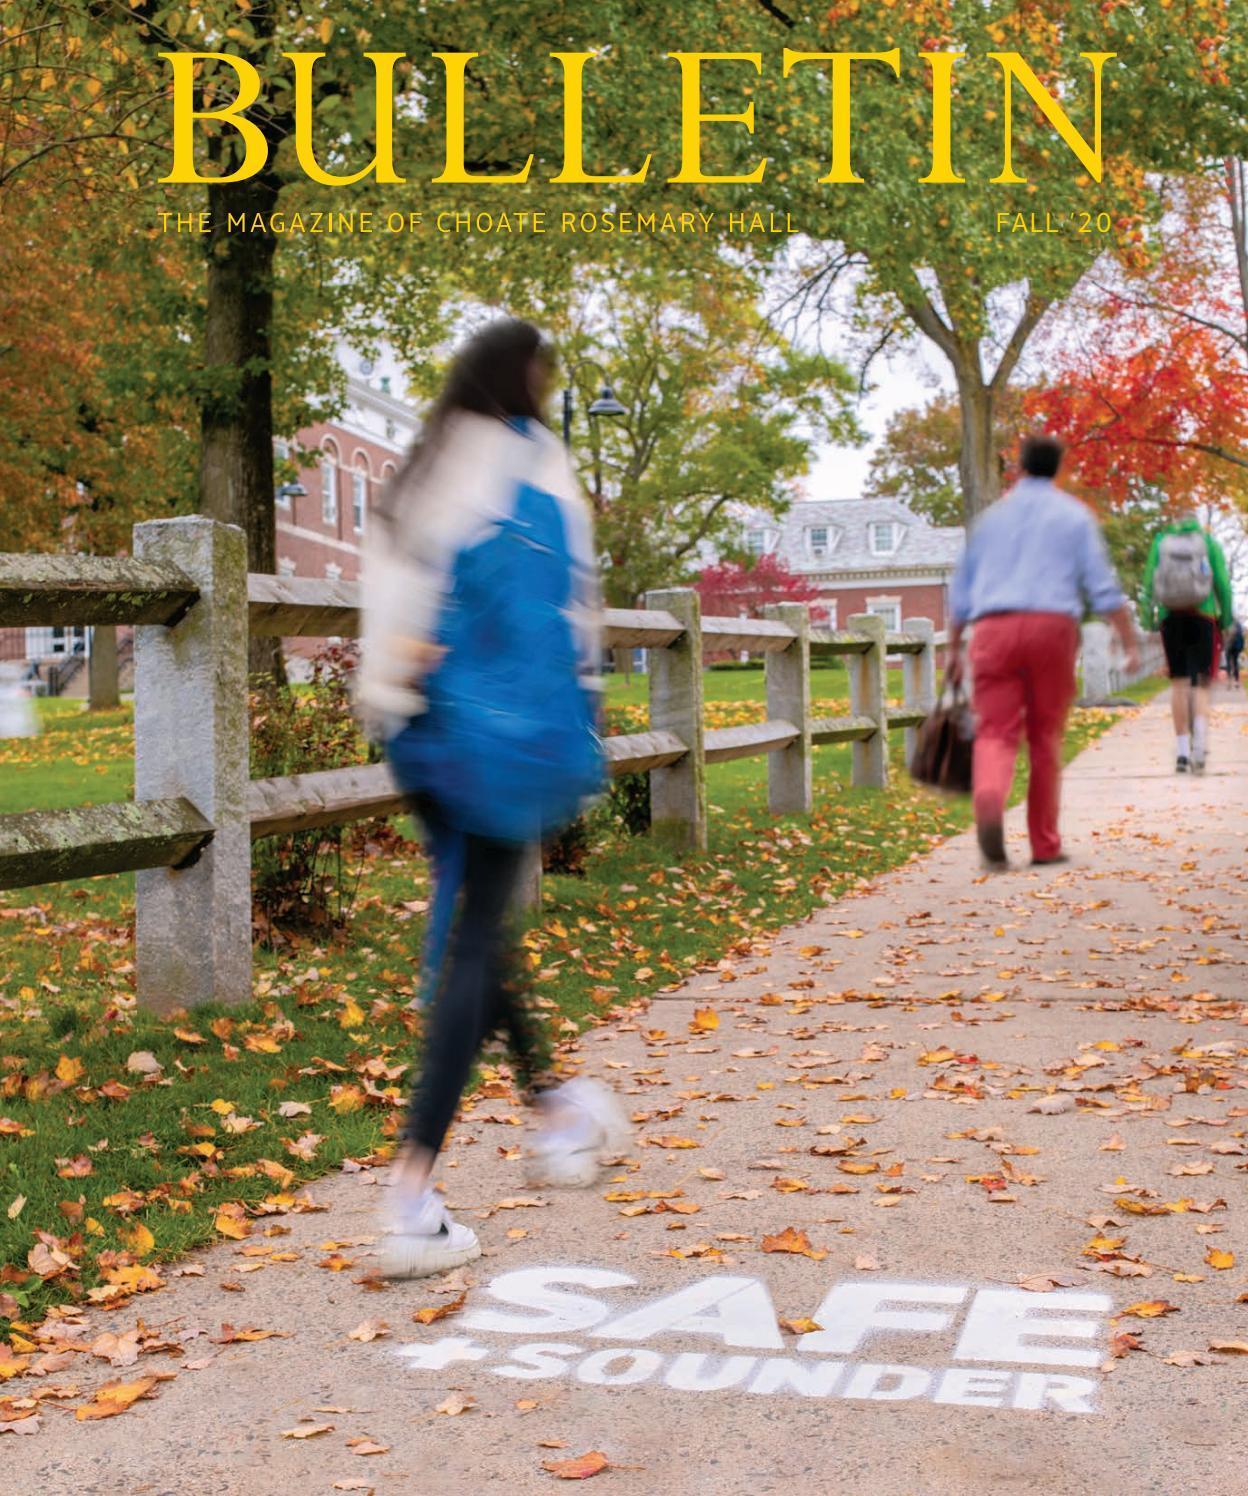 Choate Rosemary Hall Bulletin Fall 20 By Choate Rosemary Hall Issuu